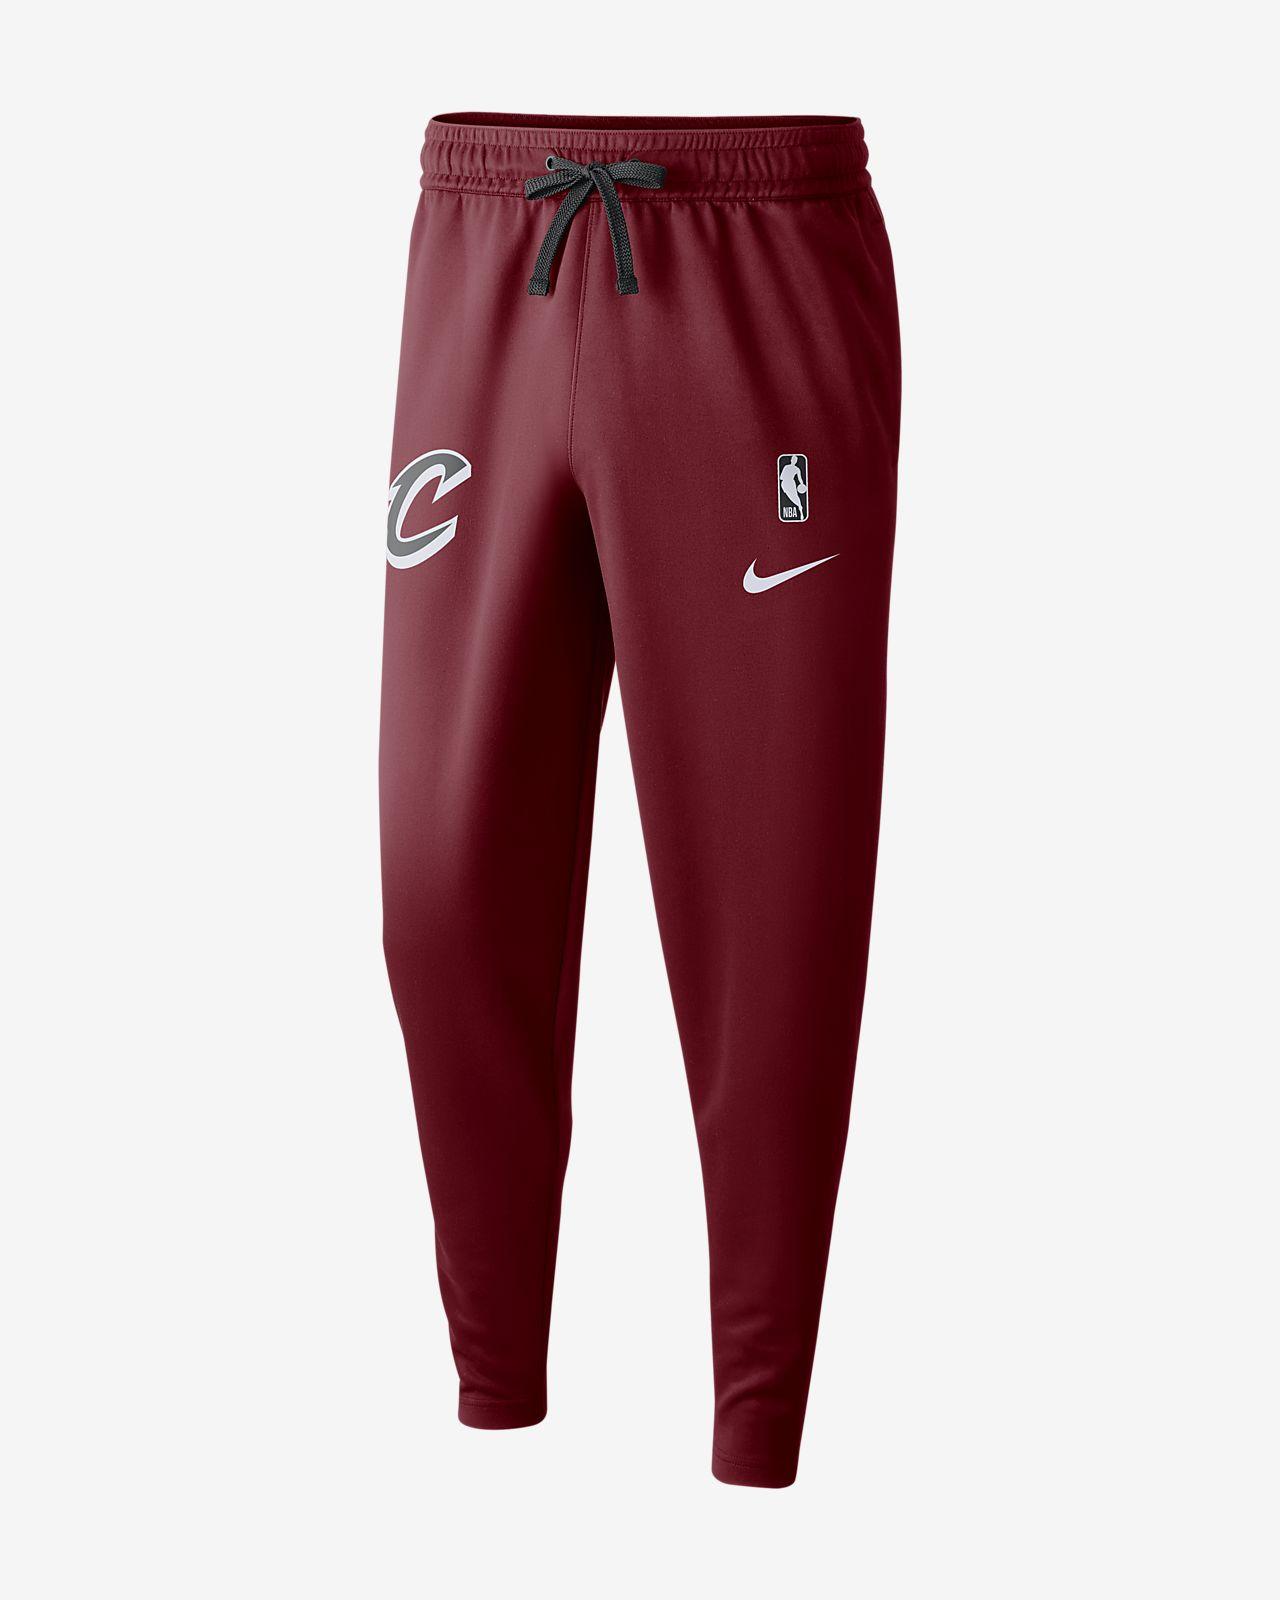 Pantaloni Cleveland Cavaliers Nike Spotlight NBA - Uomo